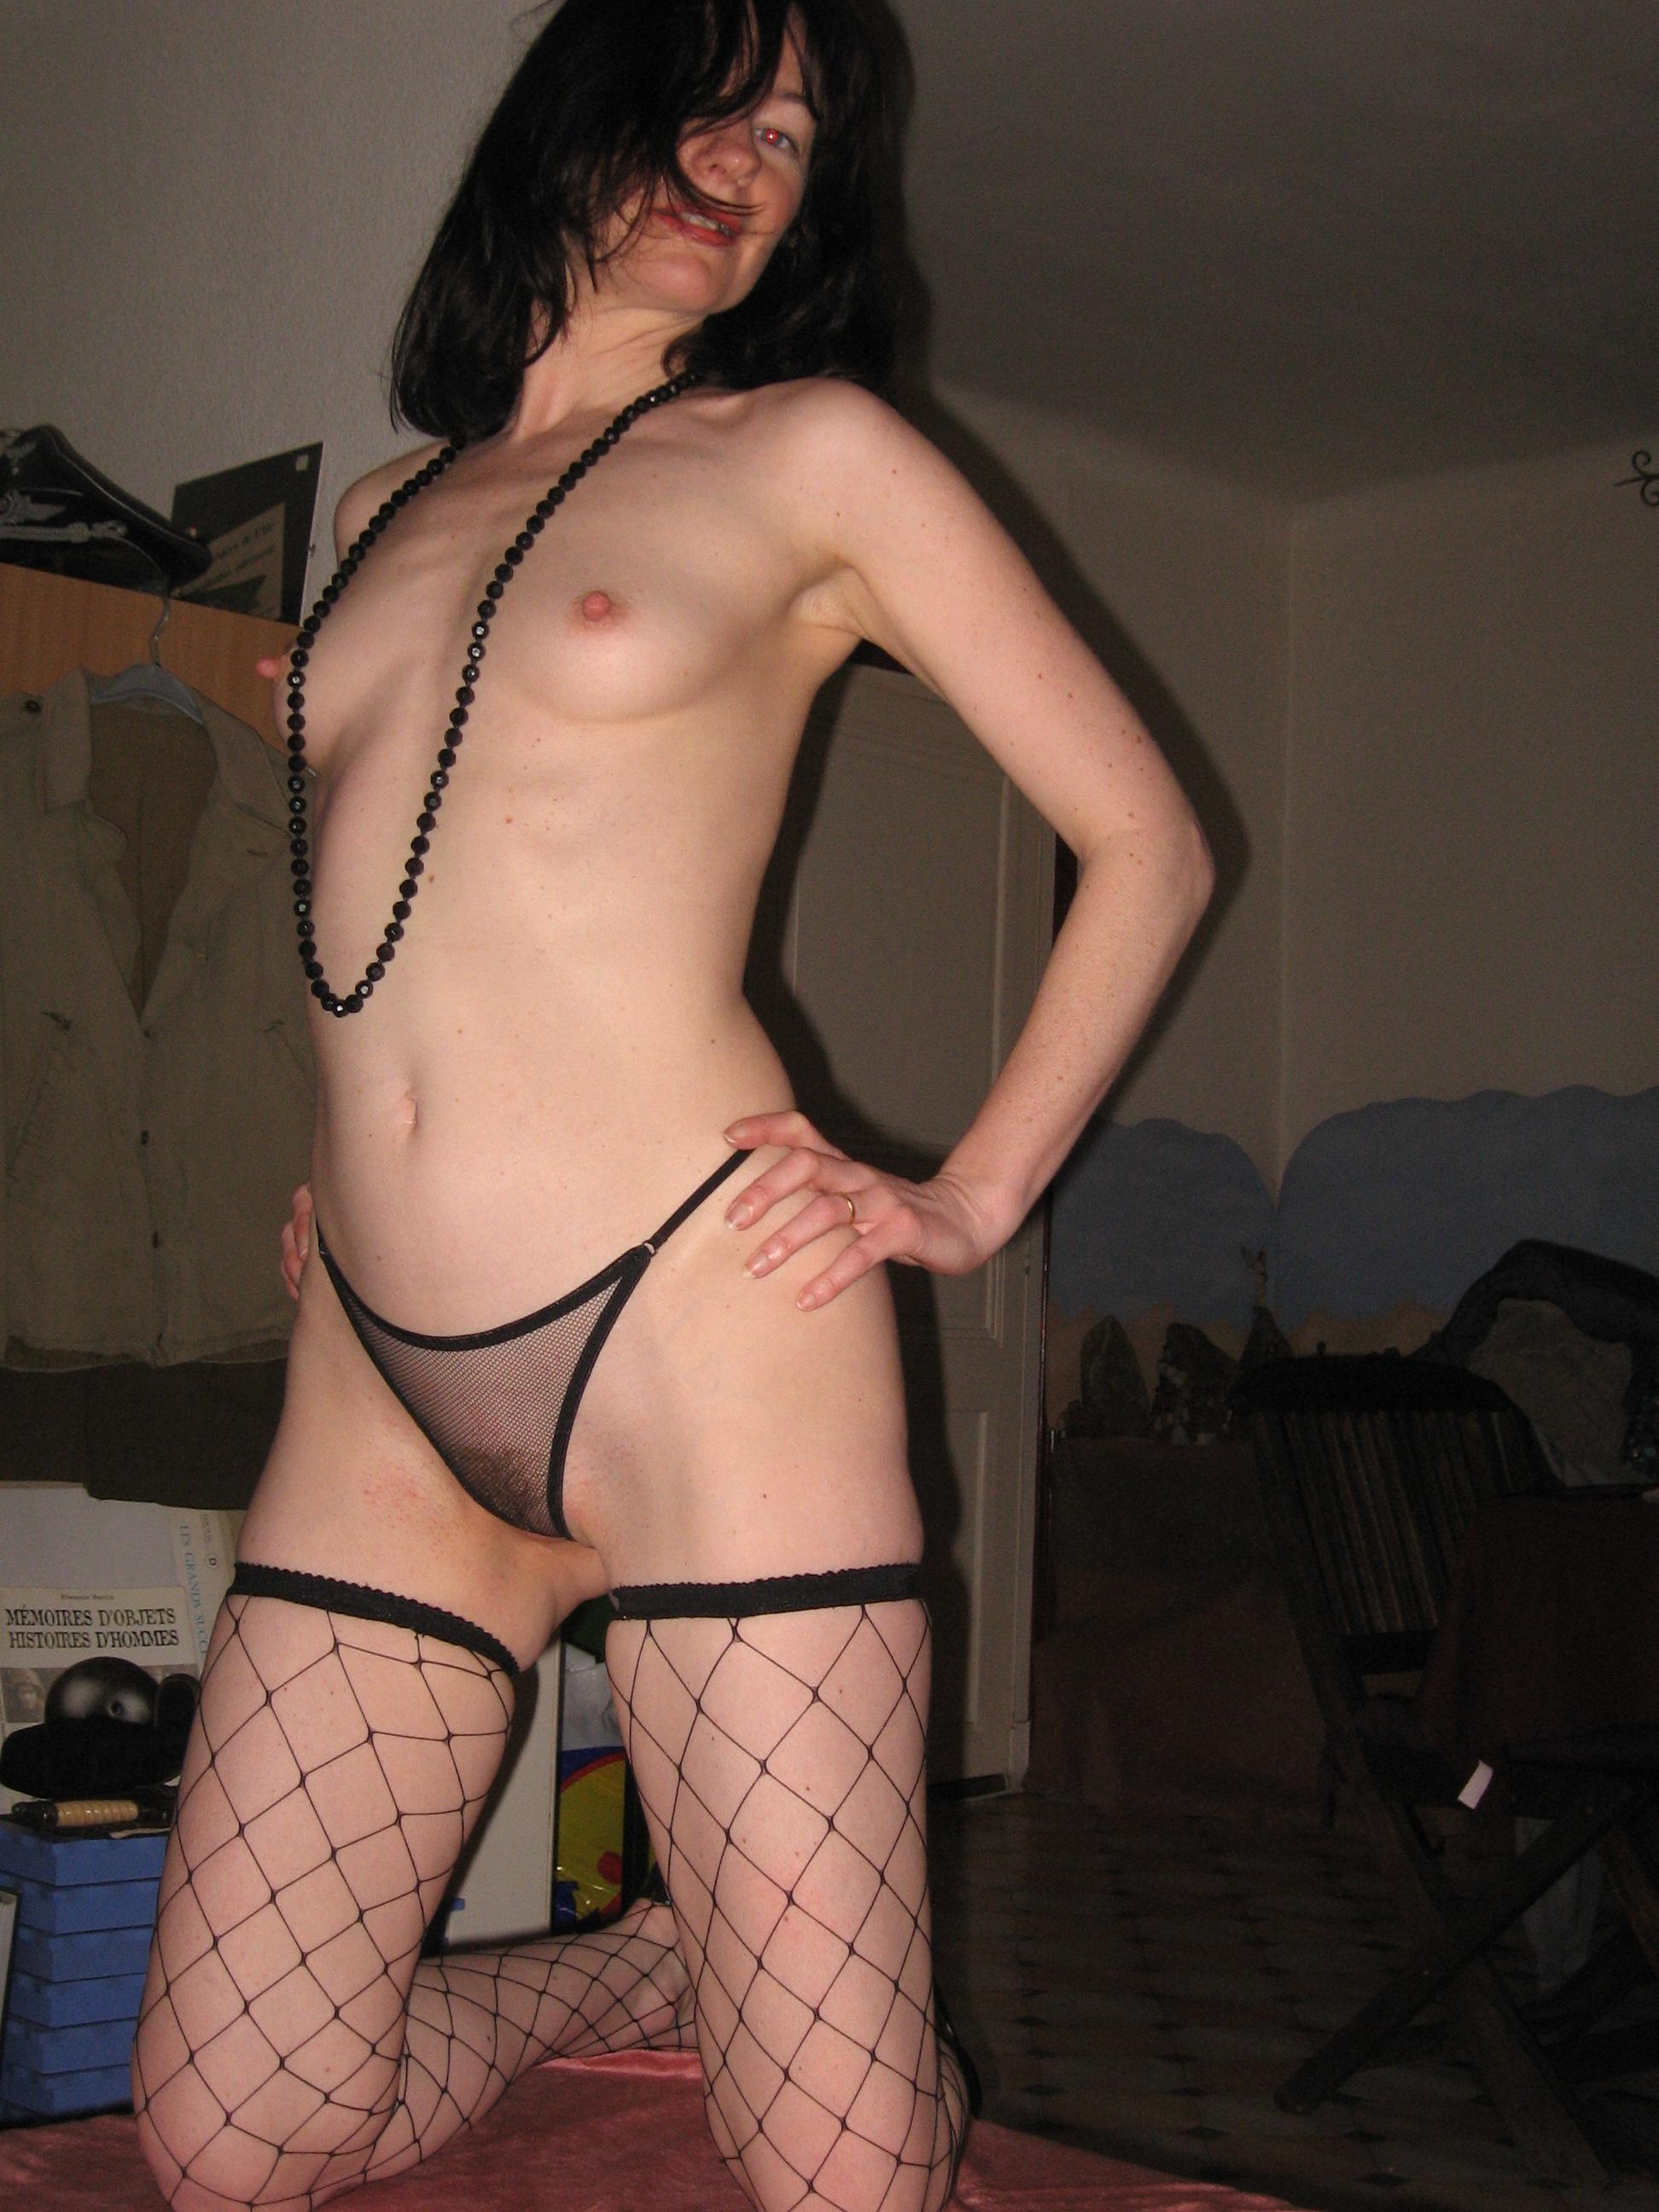 Vecinas desnudas